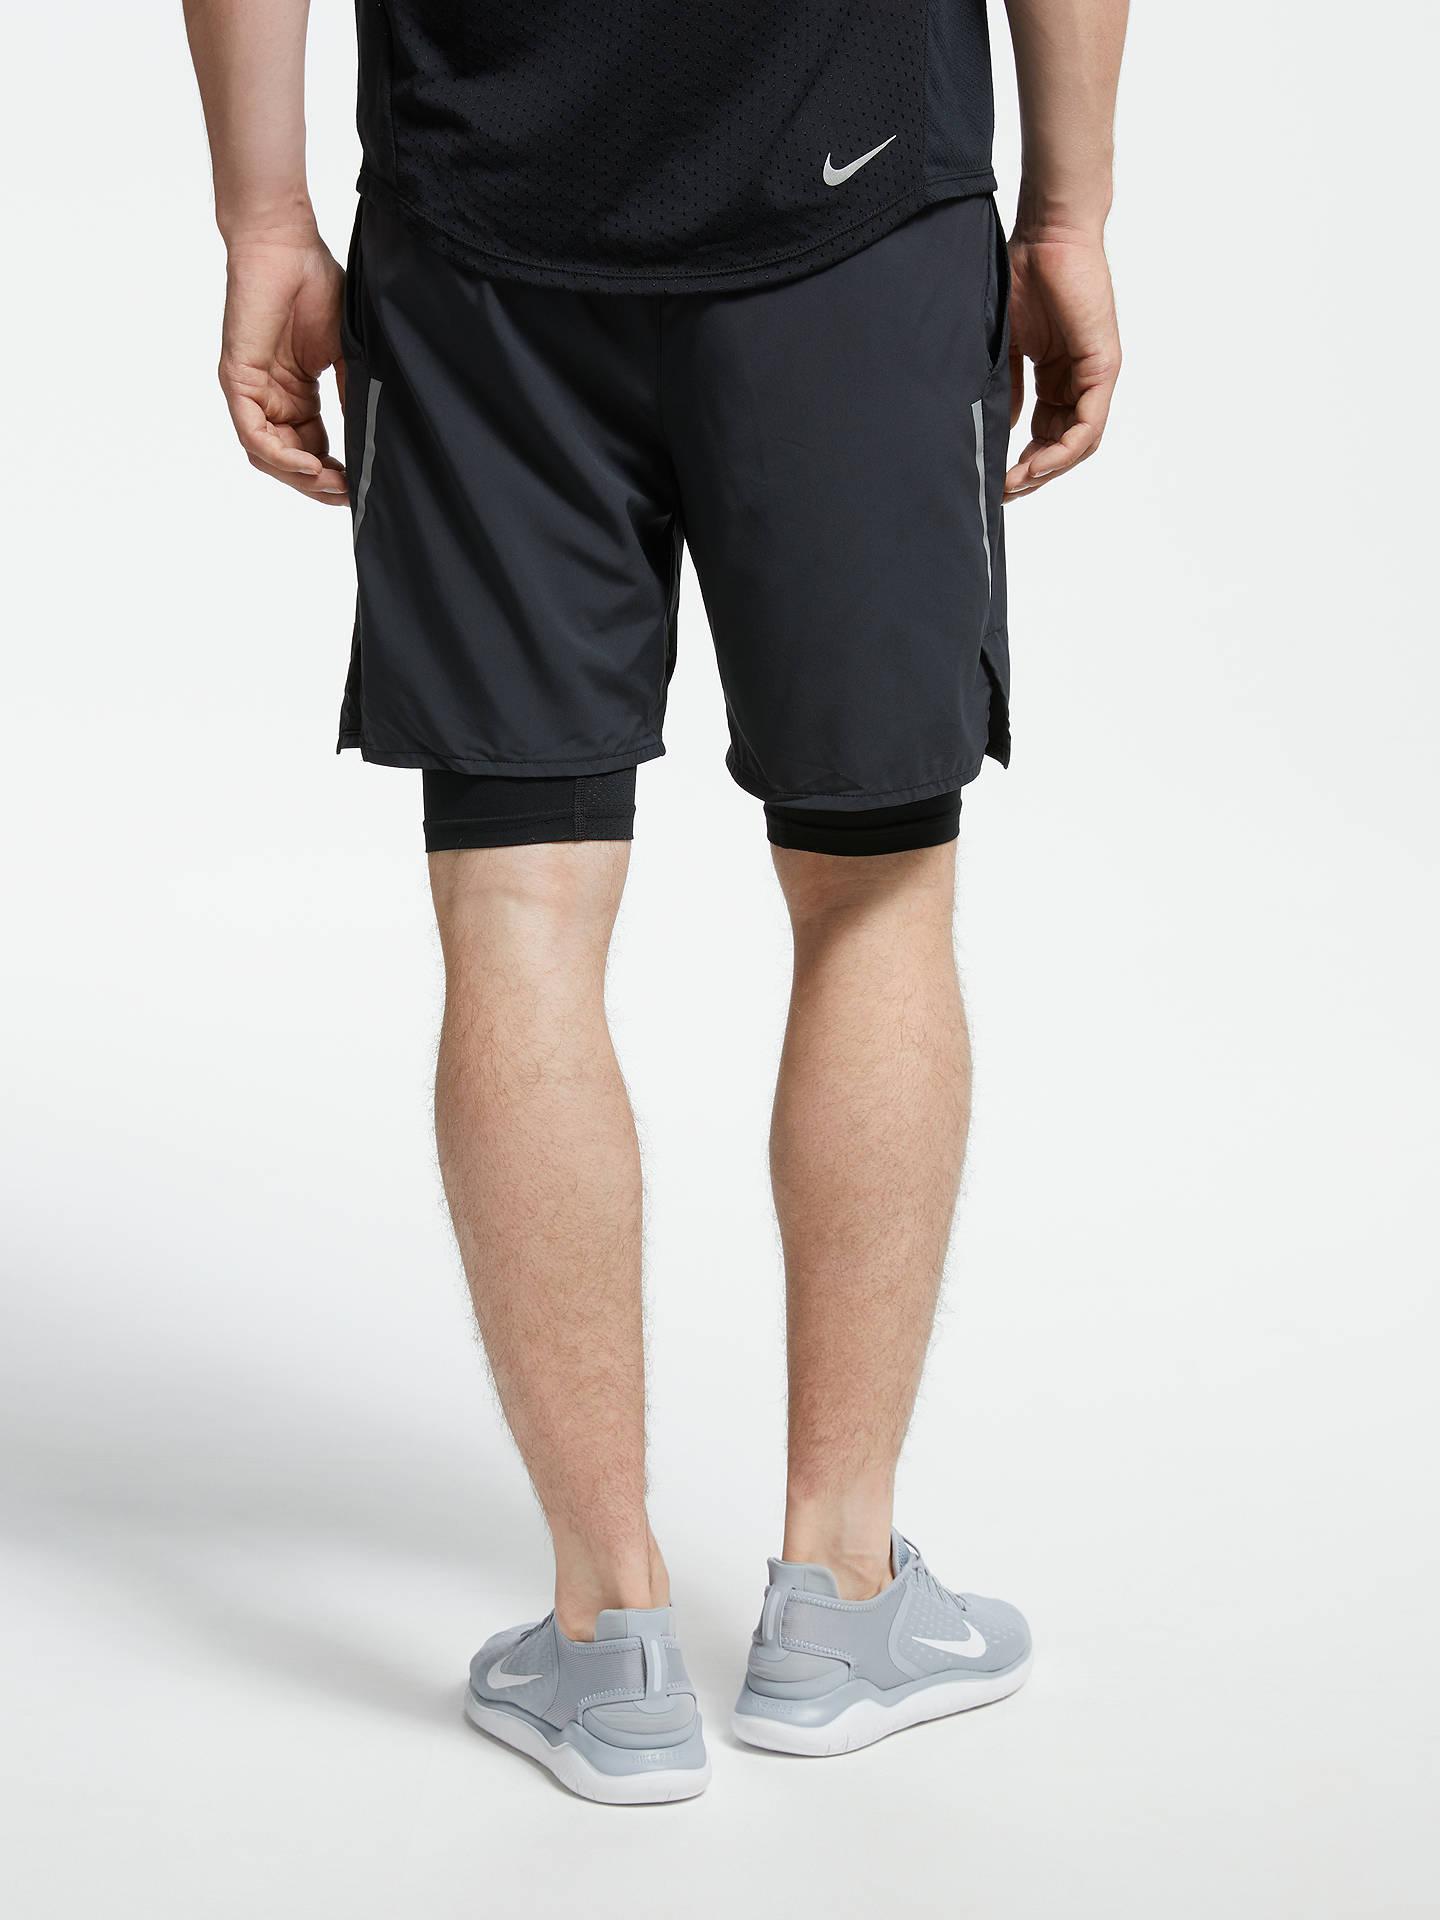 Nike Flex Stride 2 in 1 7